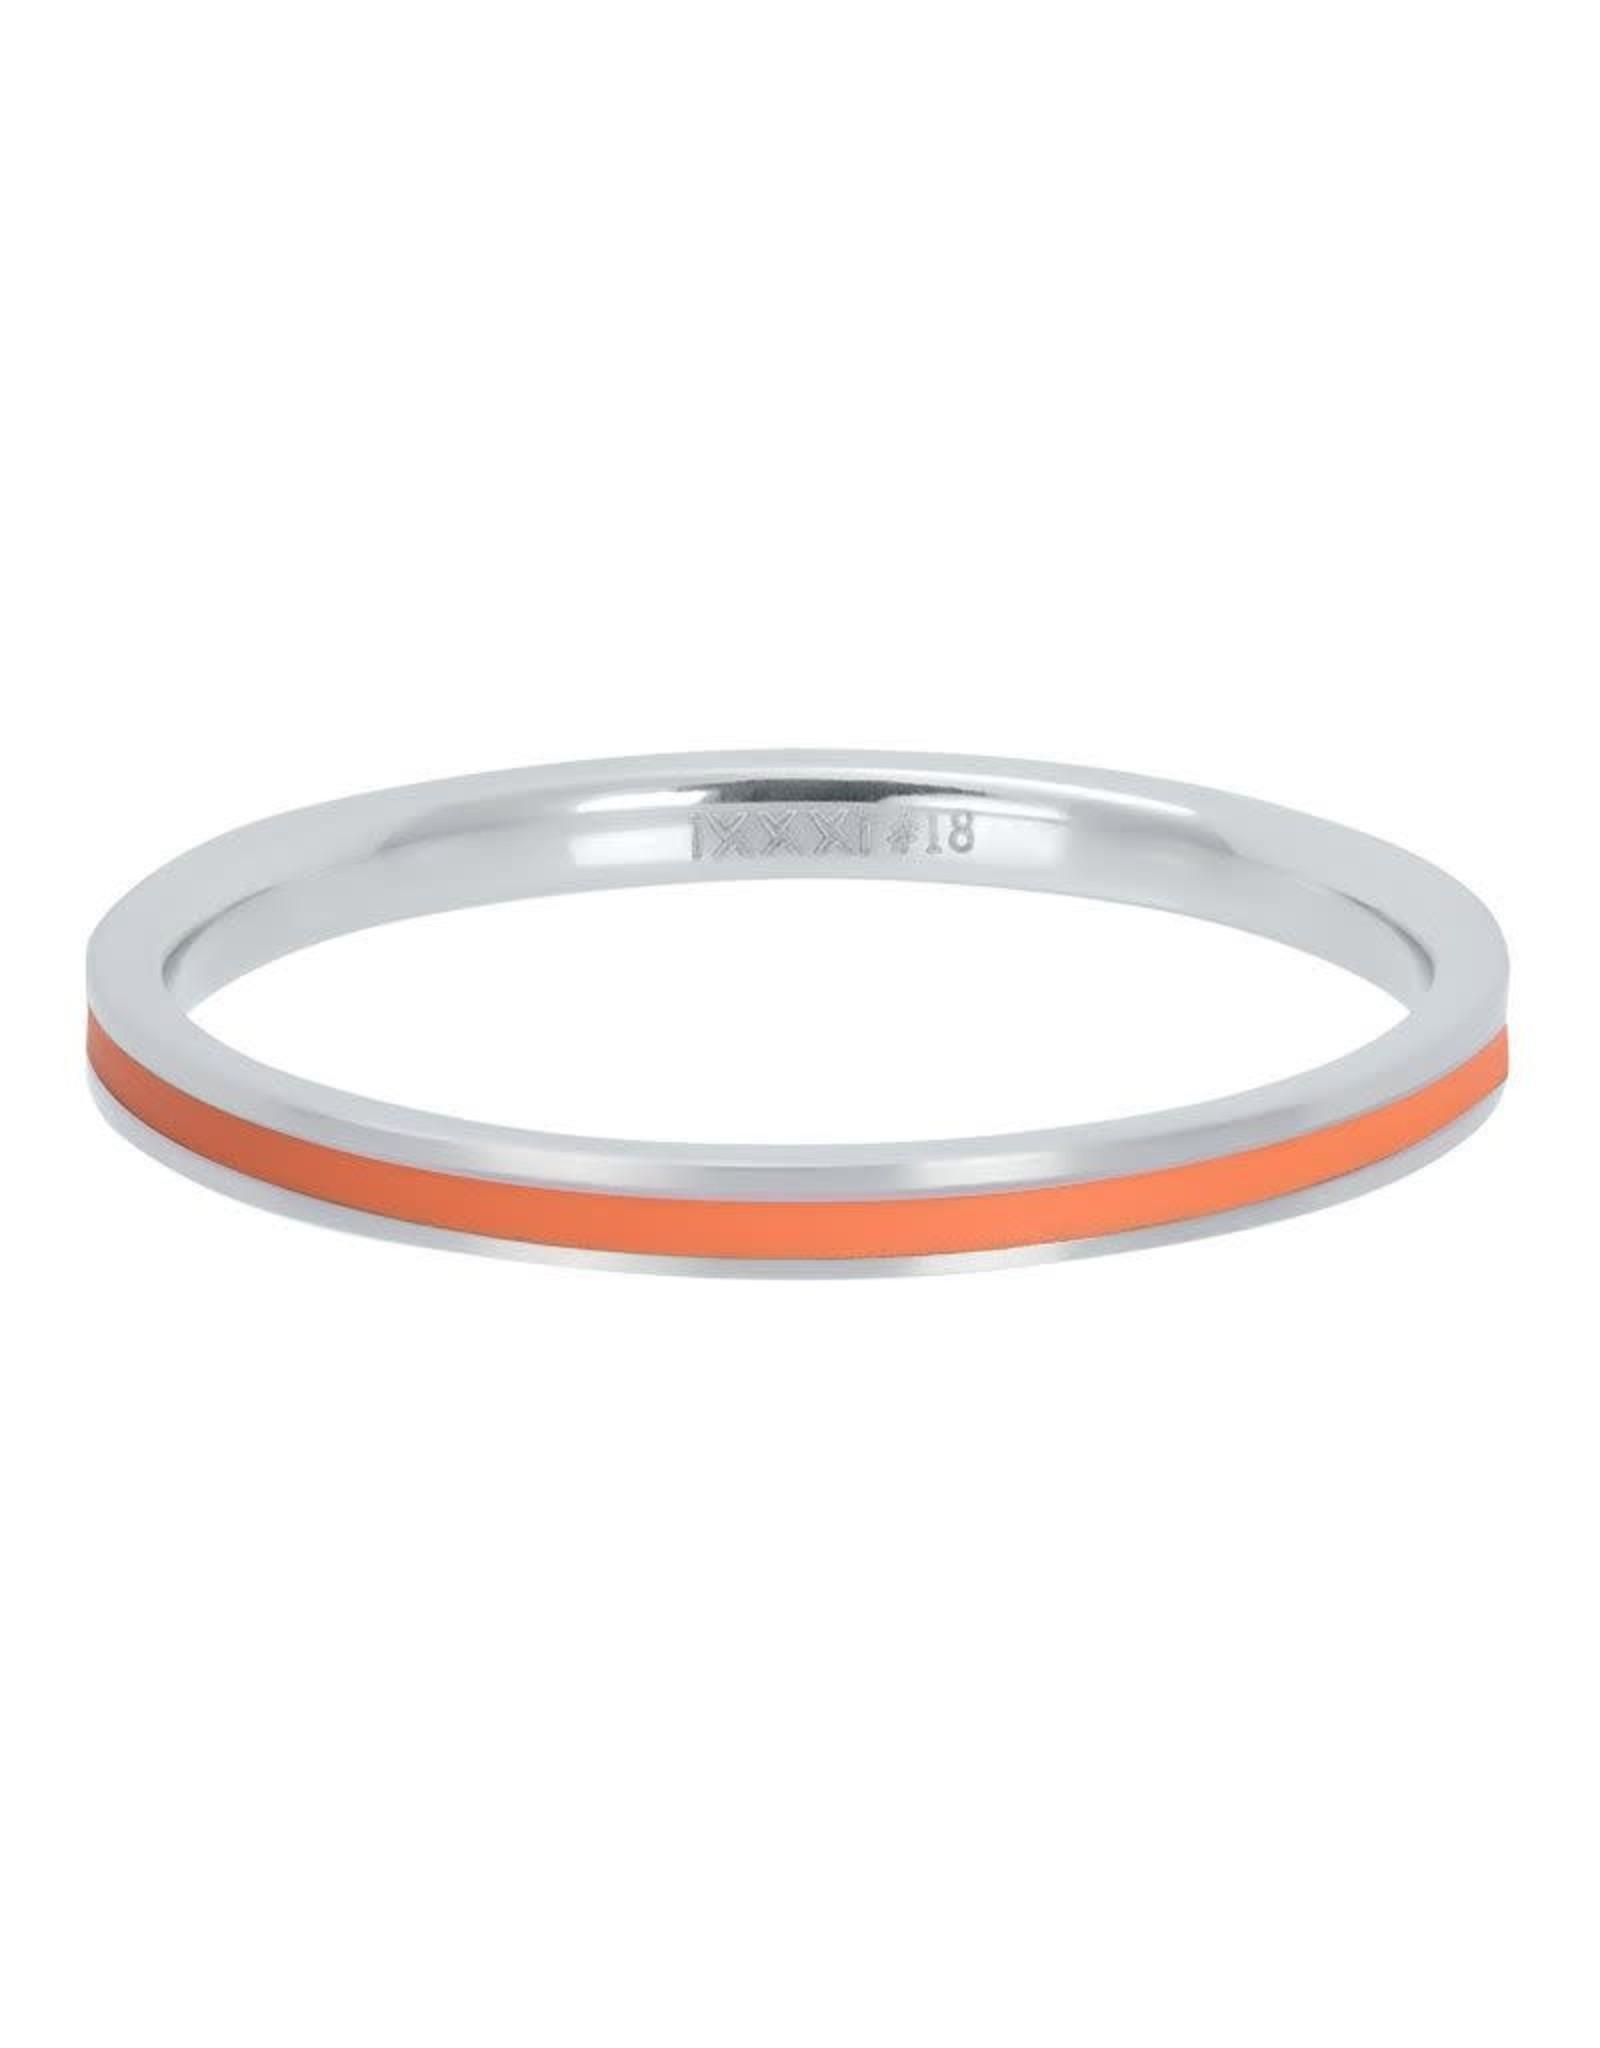 iXXXi Jewelry iXXXi vulring line coral